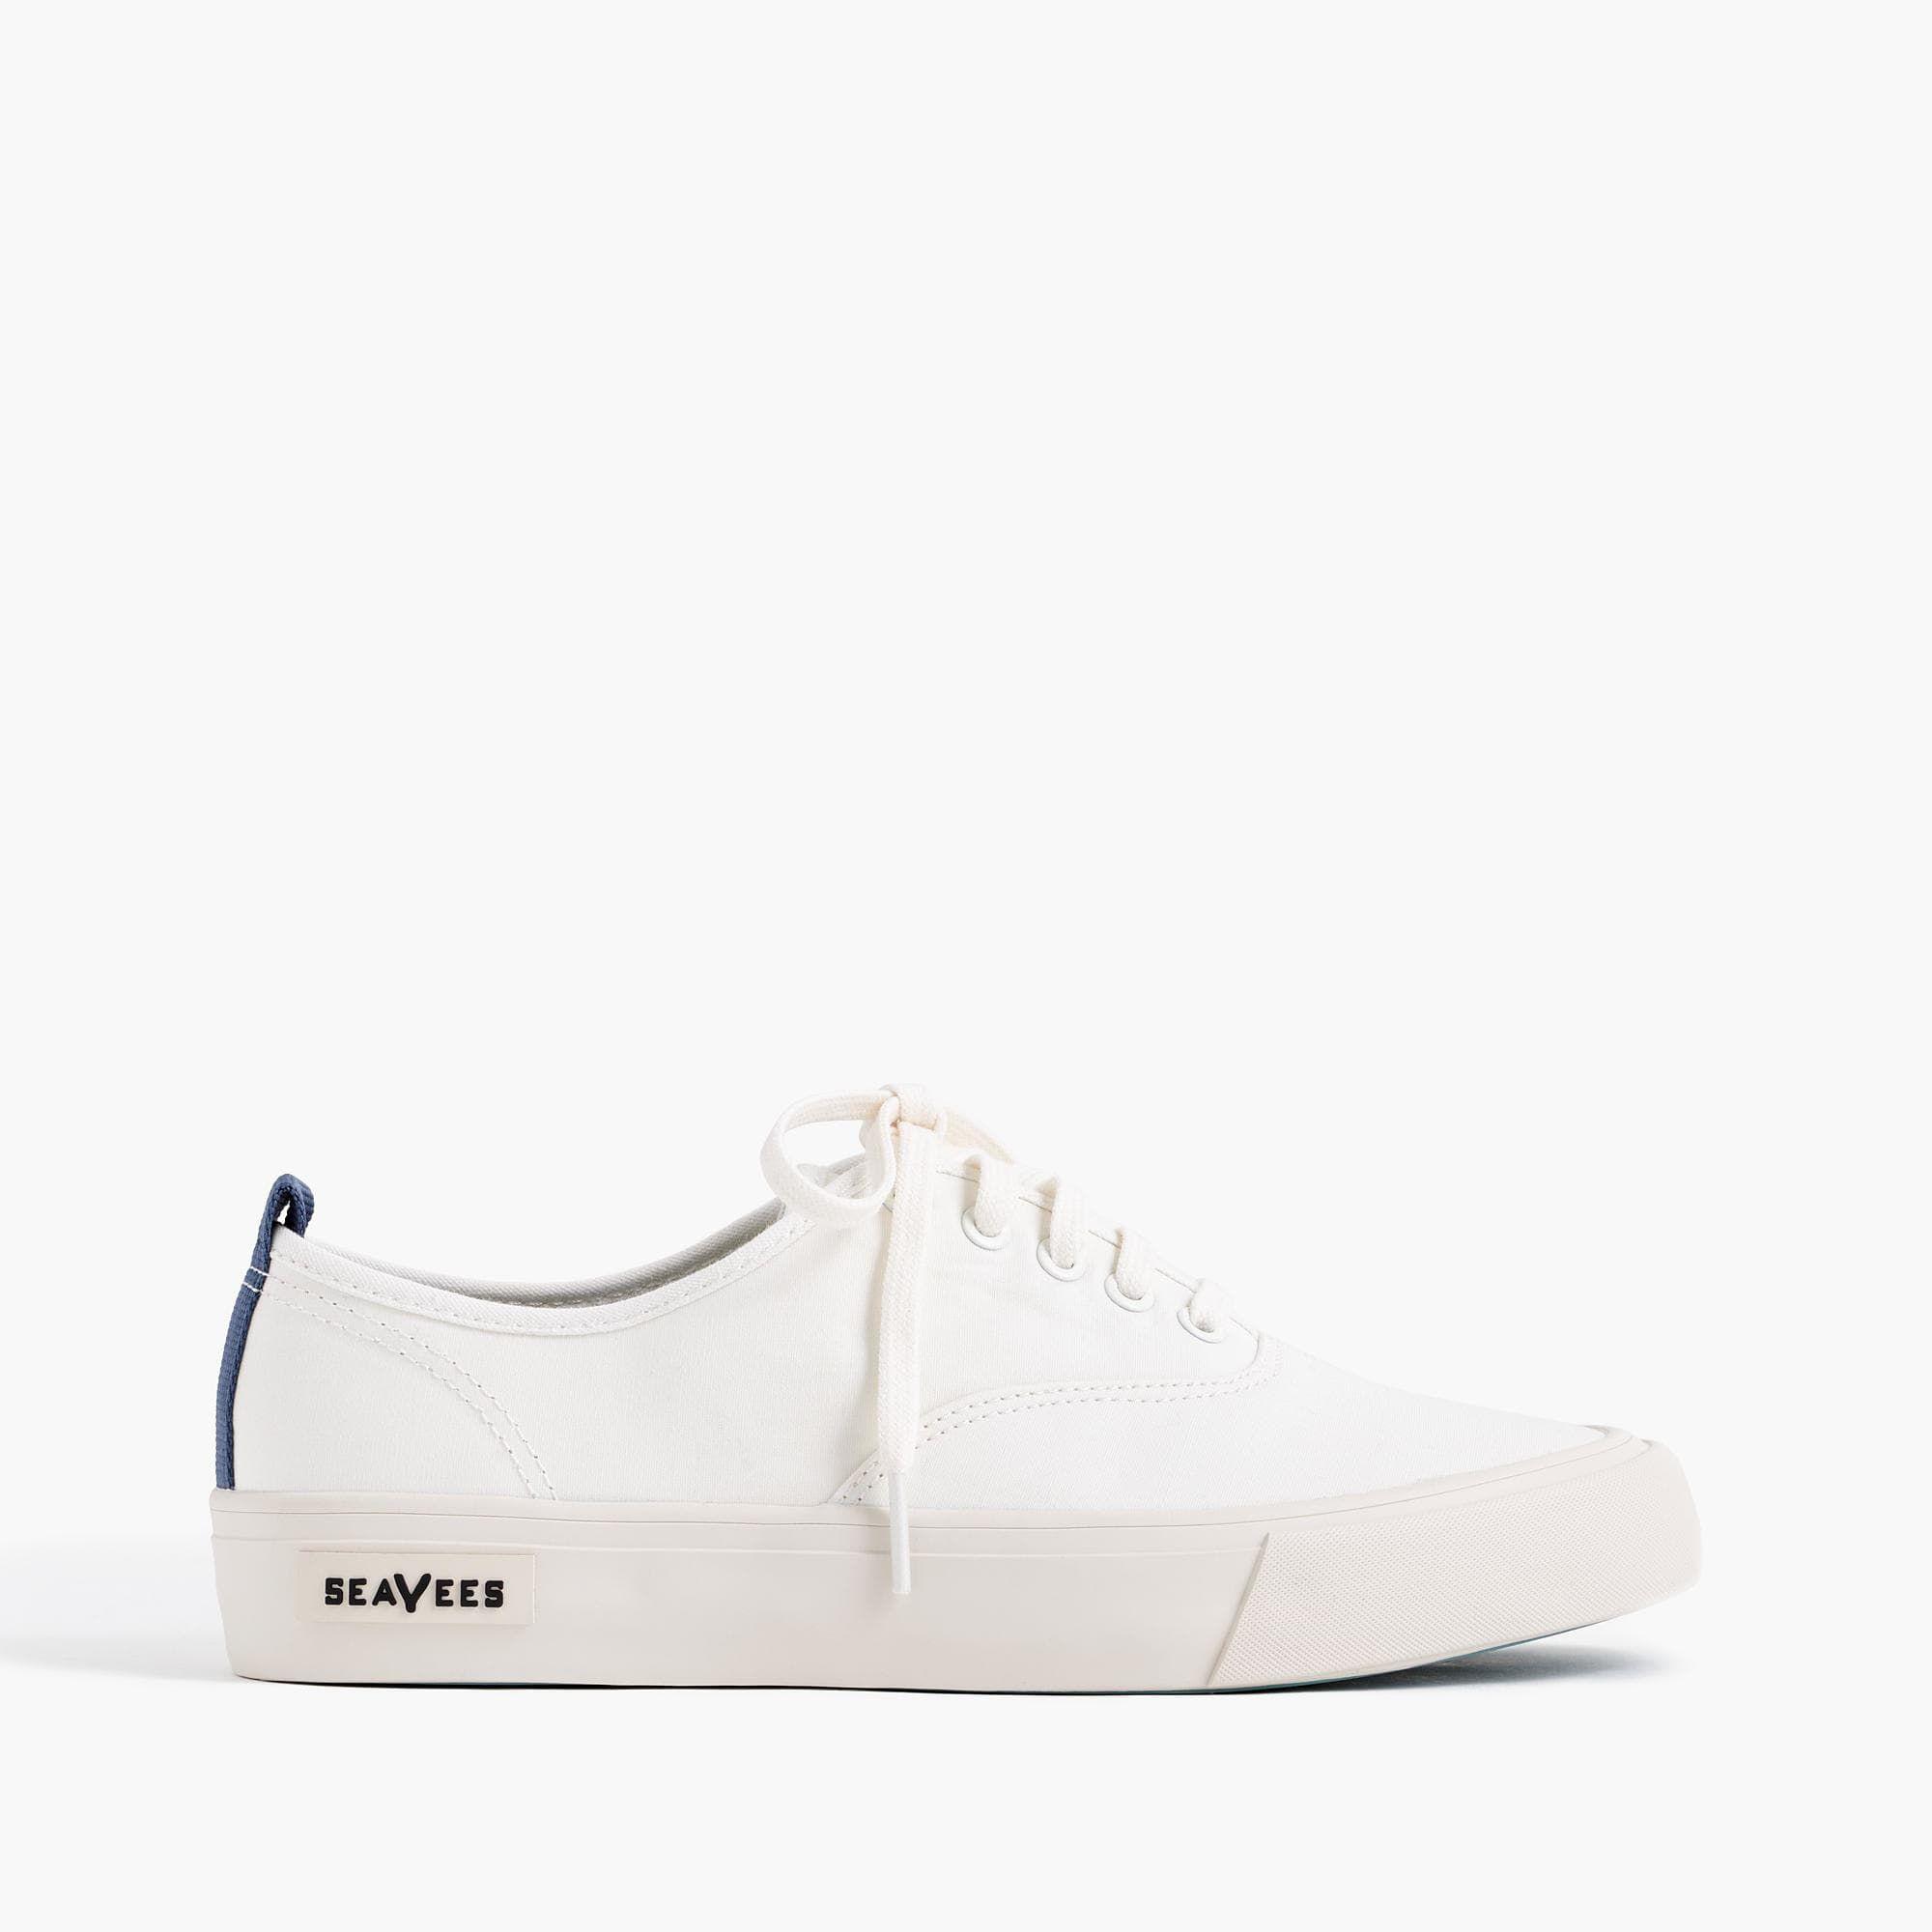 J.Crew - SeaVees   Boot shoes women